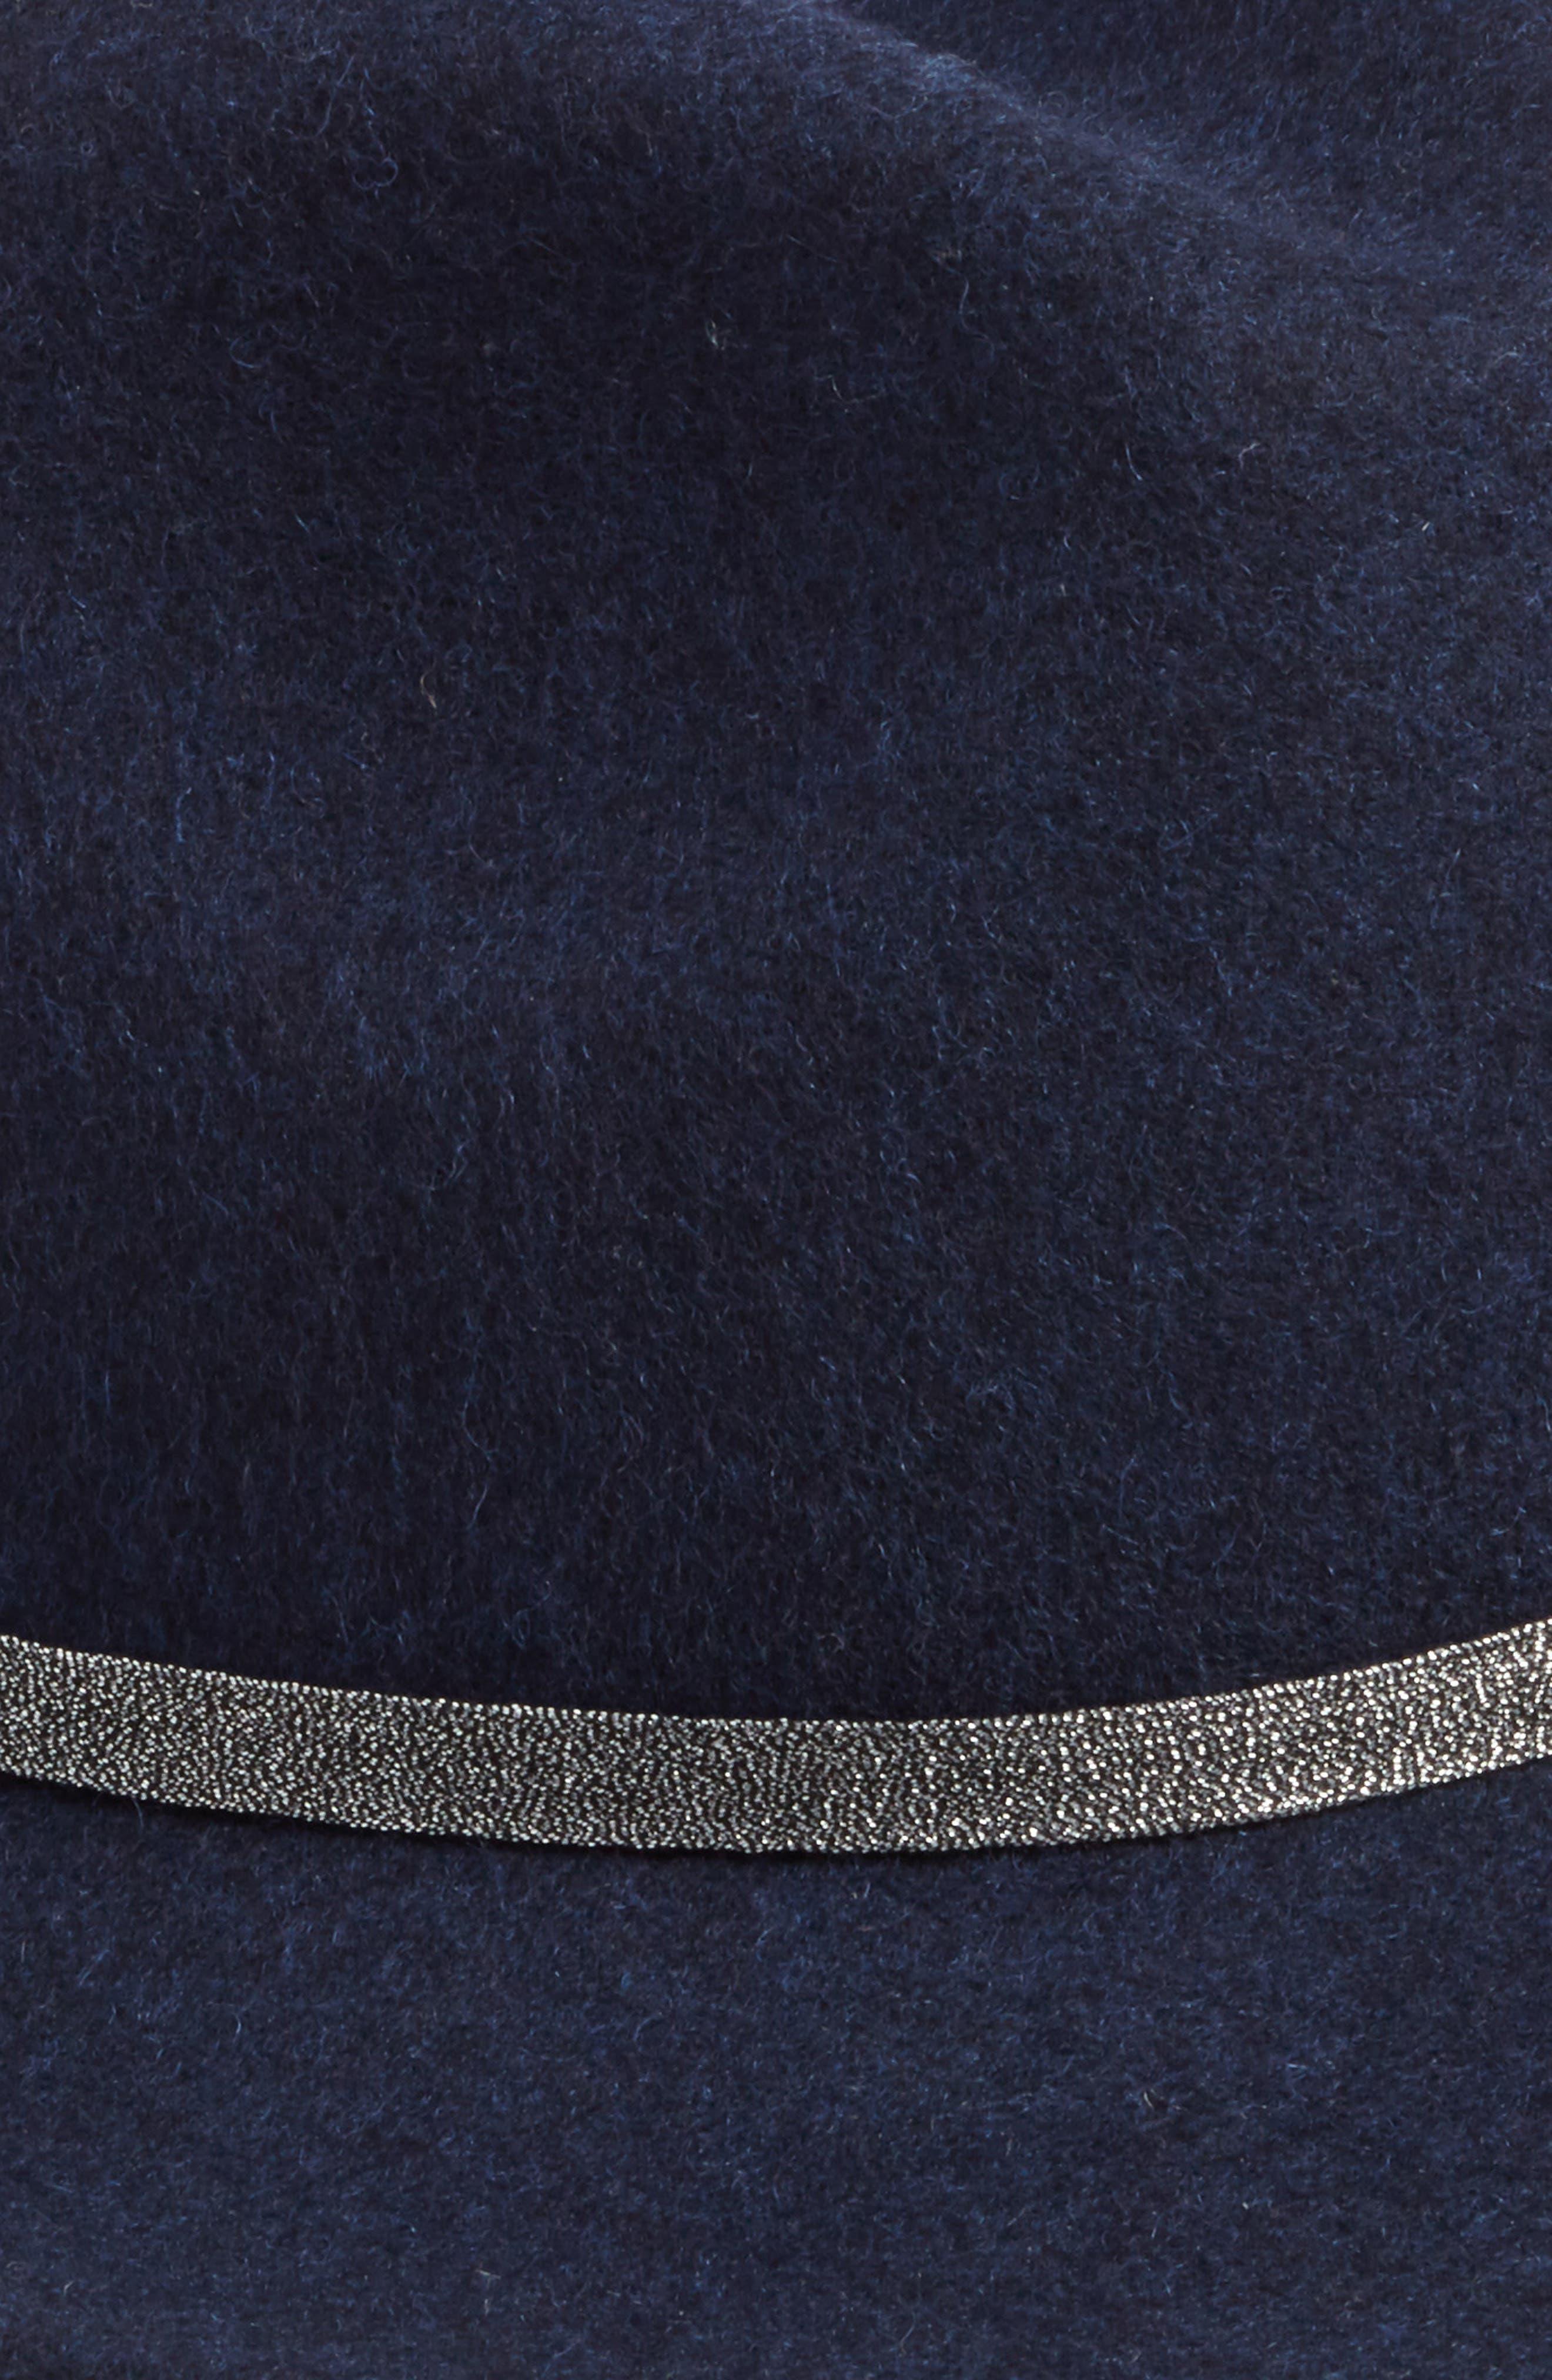 Metallic Band Wool Felt Panama Hat,                             Alternate thumbnail 8, color,